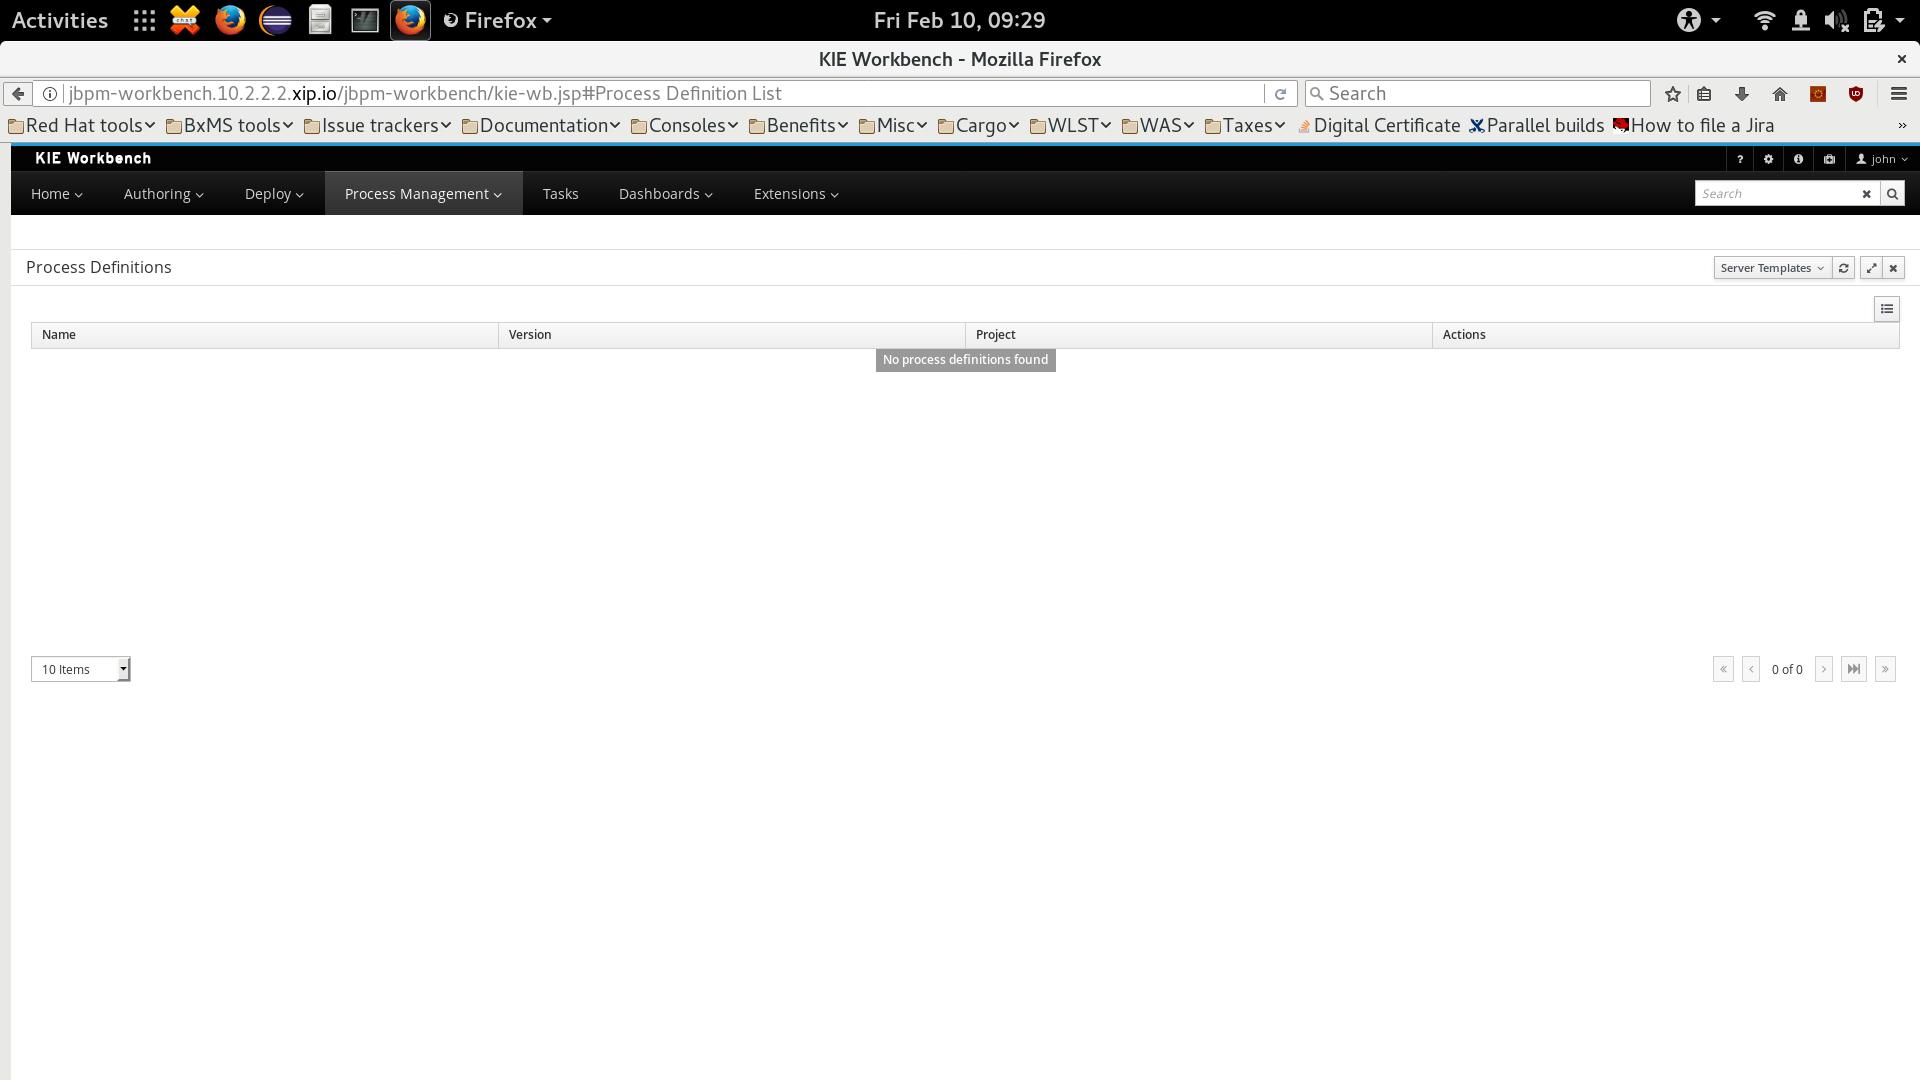 JBPM-5671] Server template selection - JBoss Issue Tracker